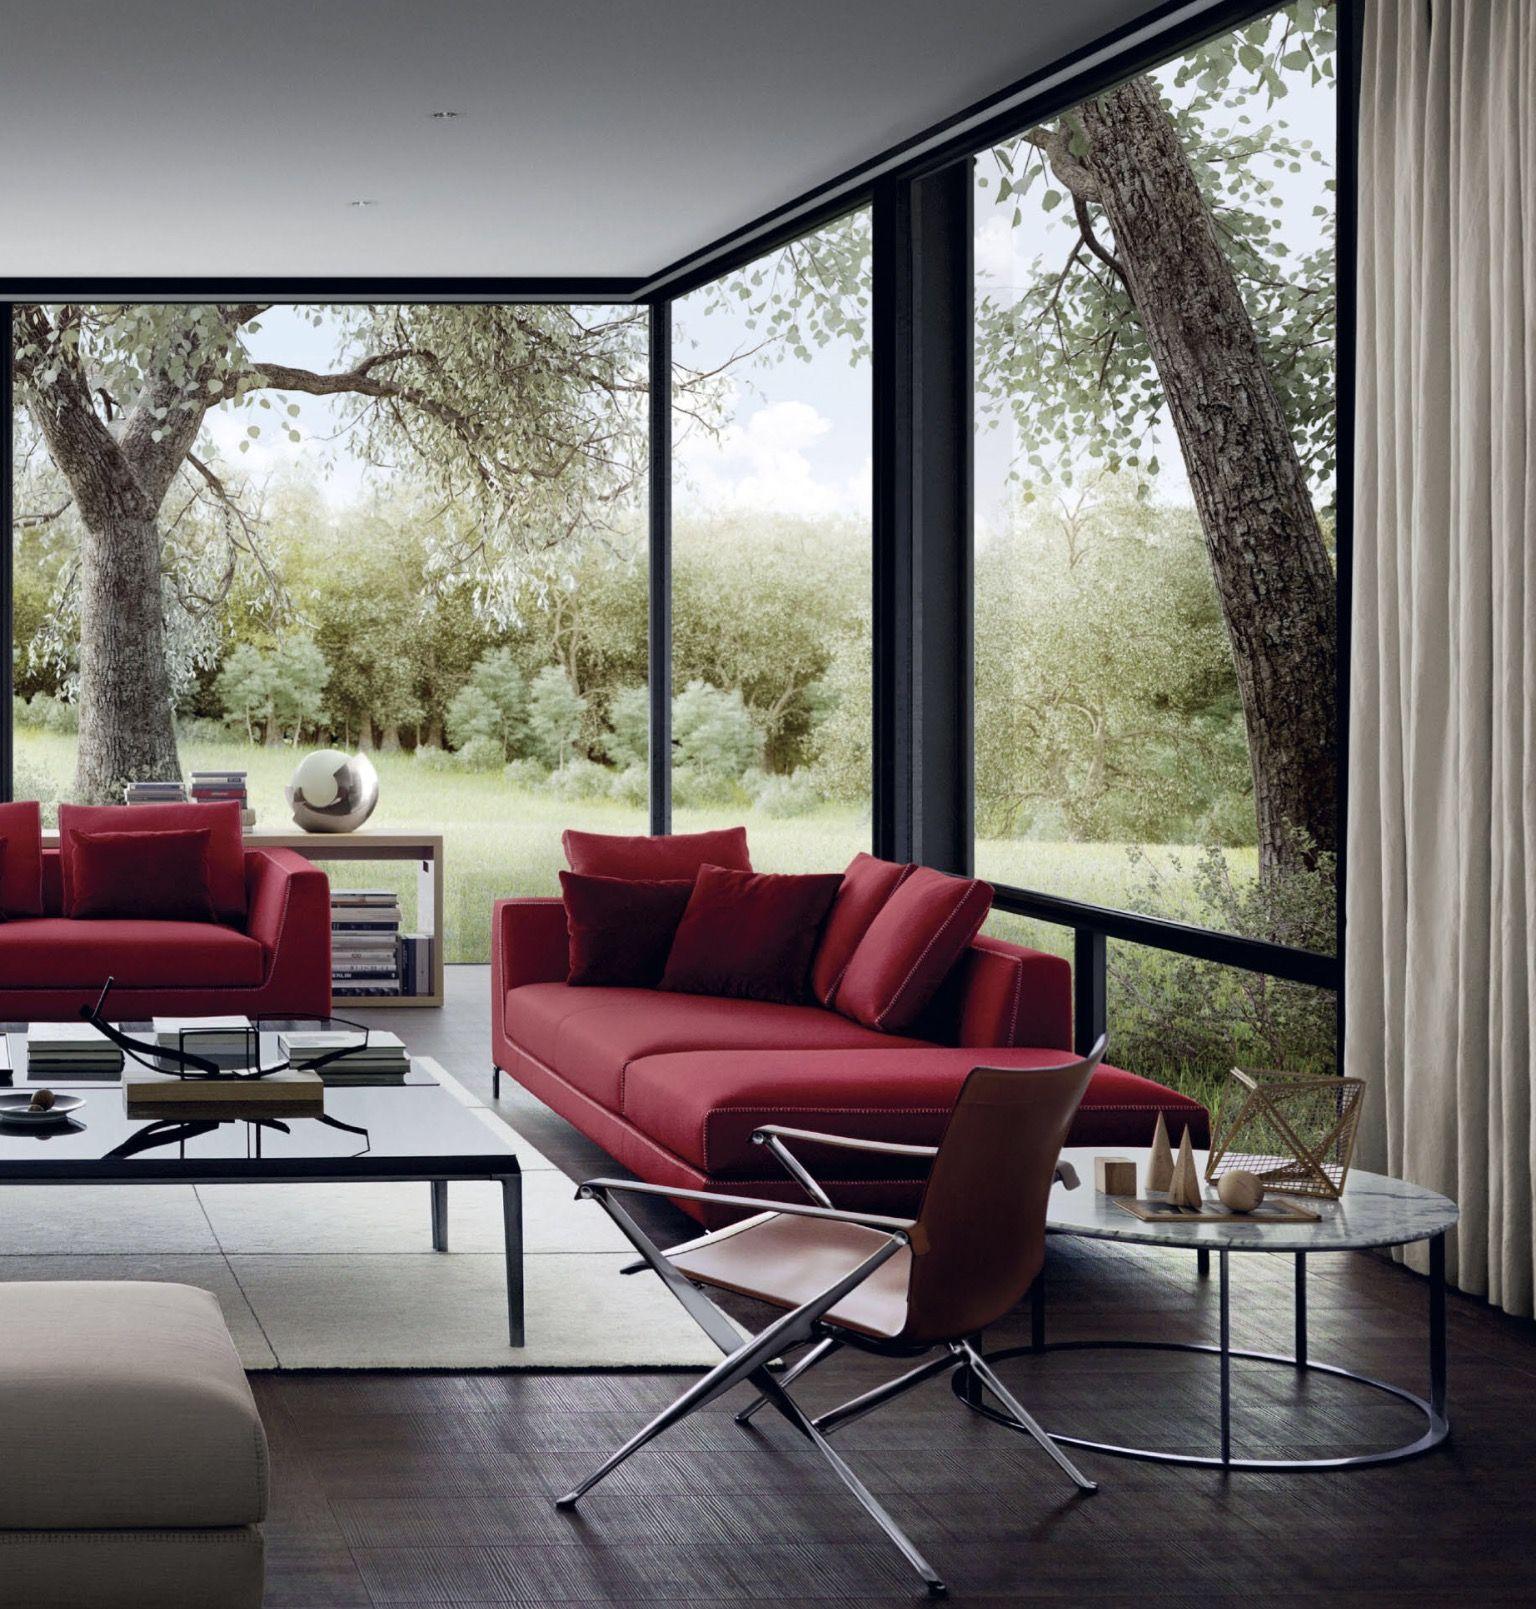 49+ Elle decor patio furniture ideas in 2021